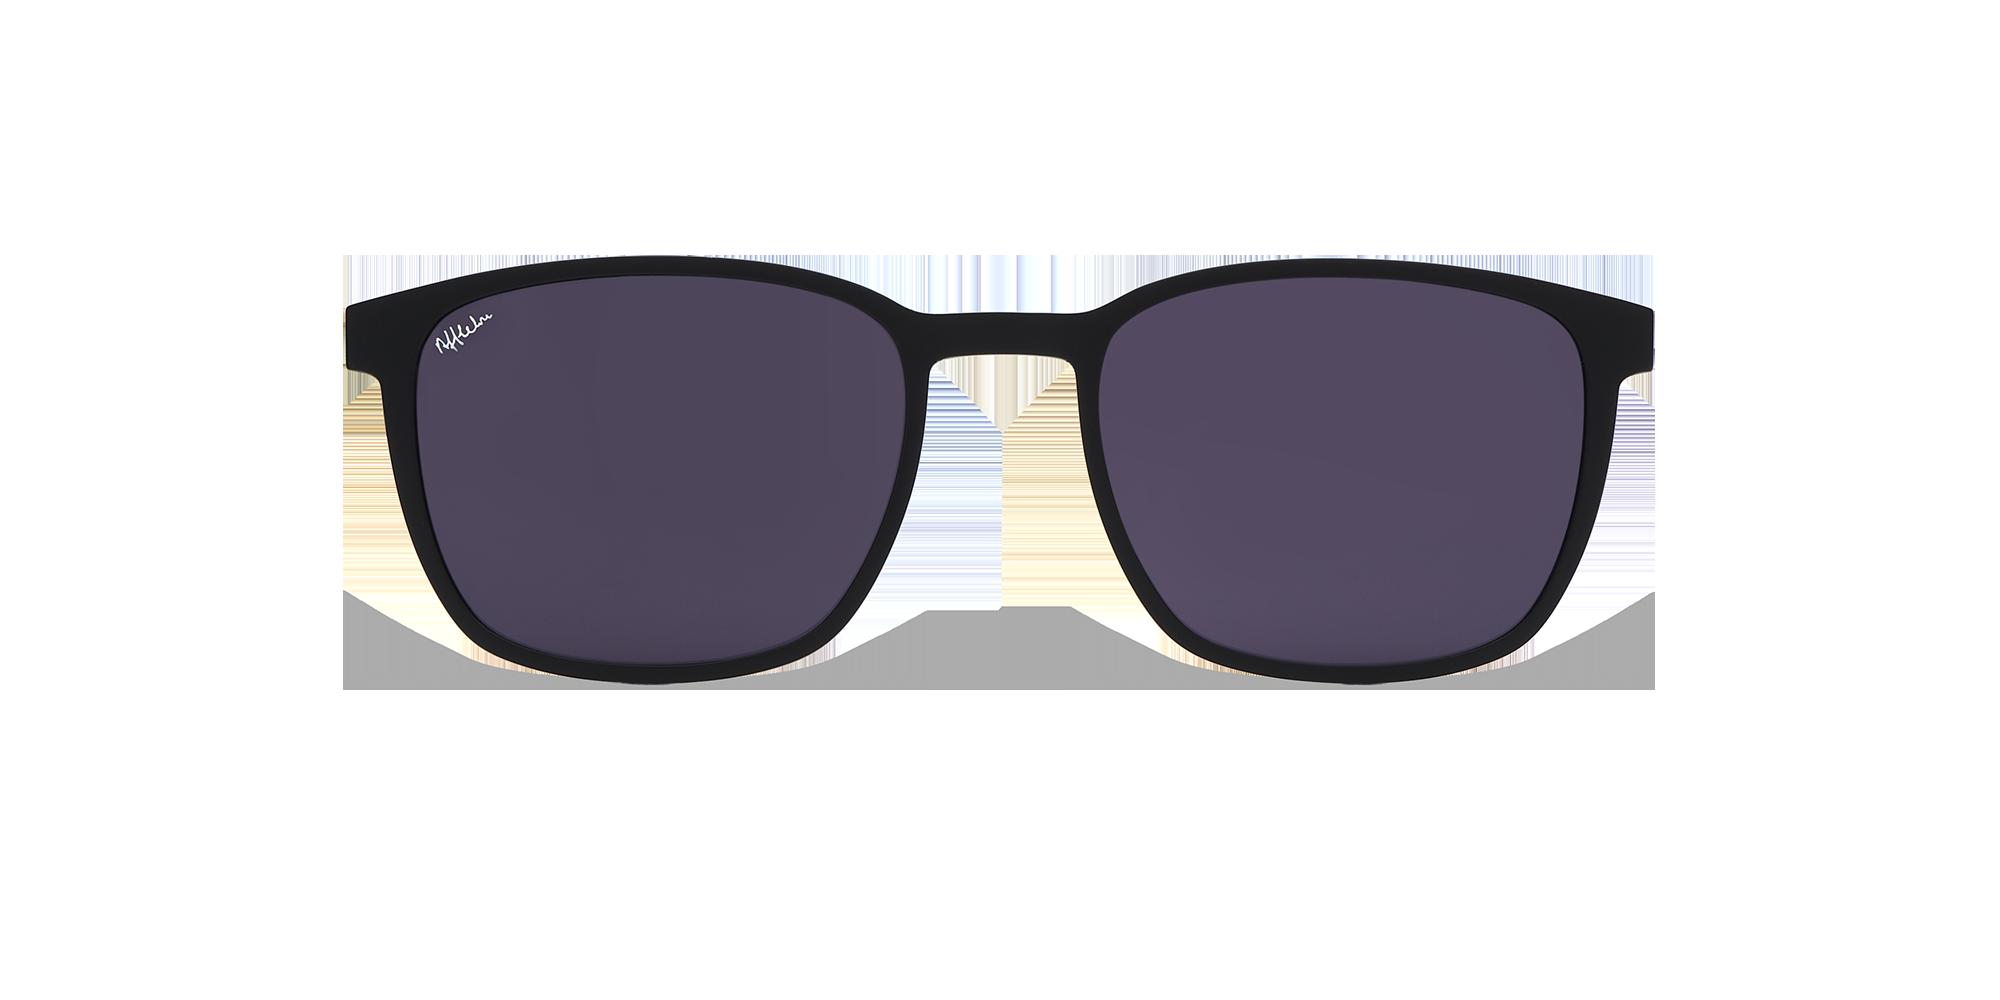 afflelou/france/products/smart_clip/clips_glasses/TMK42S4BK015319.png